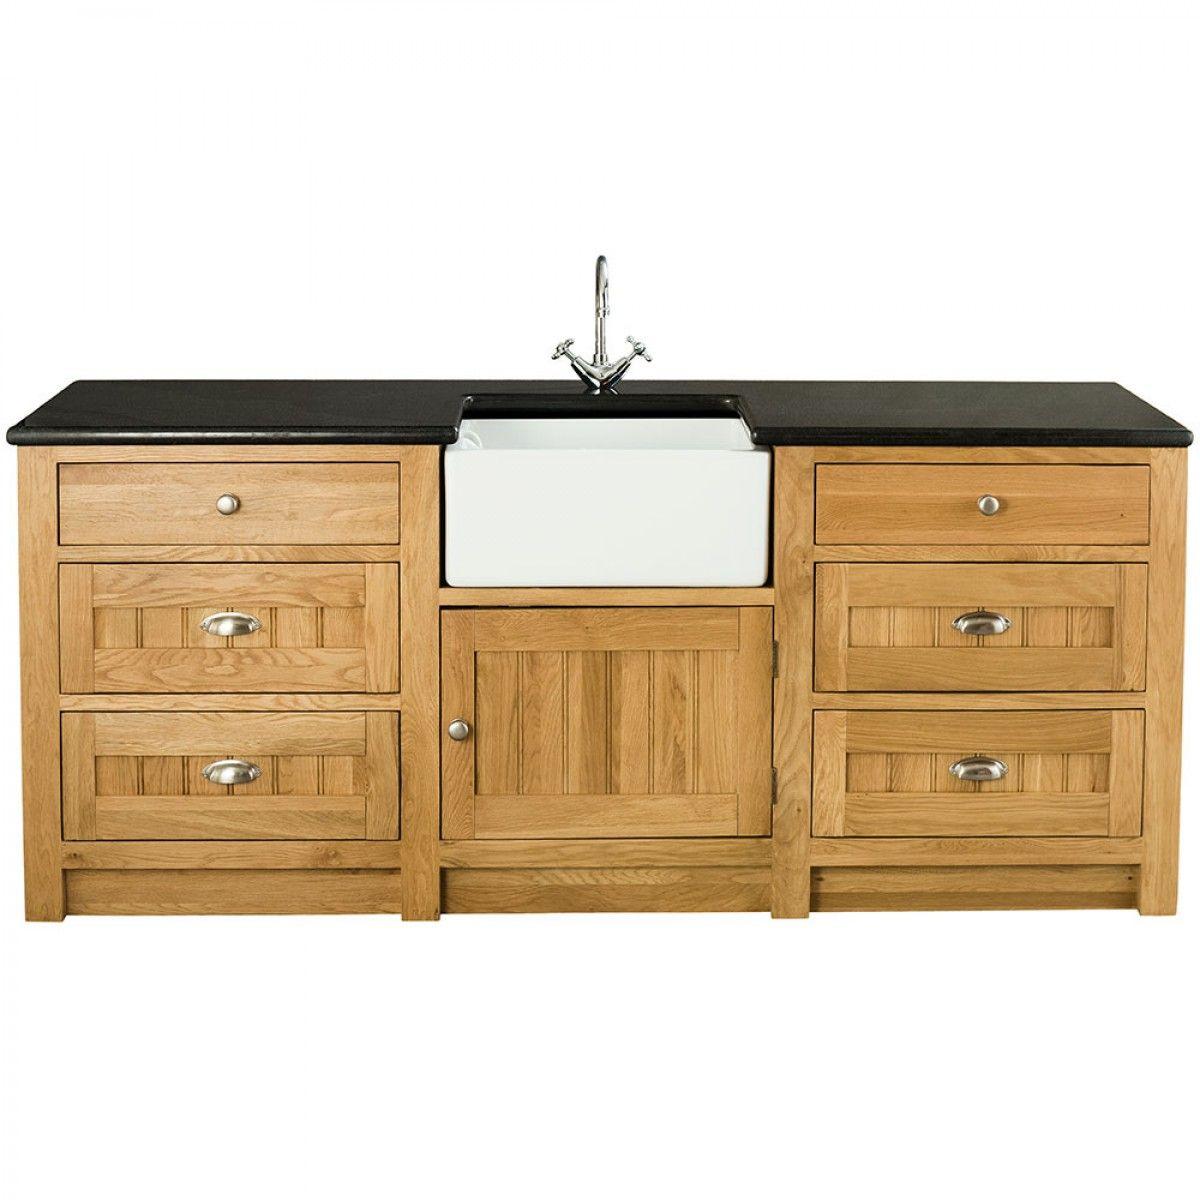 Orchard Oak 1 Door6 Drawer Sink Cabinet 2130X665X900Mm  Sinks Interesting Sink Cabinet Kitchen Inspiration Design